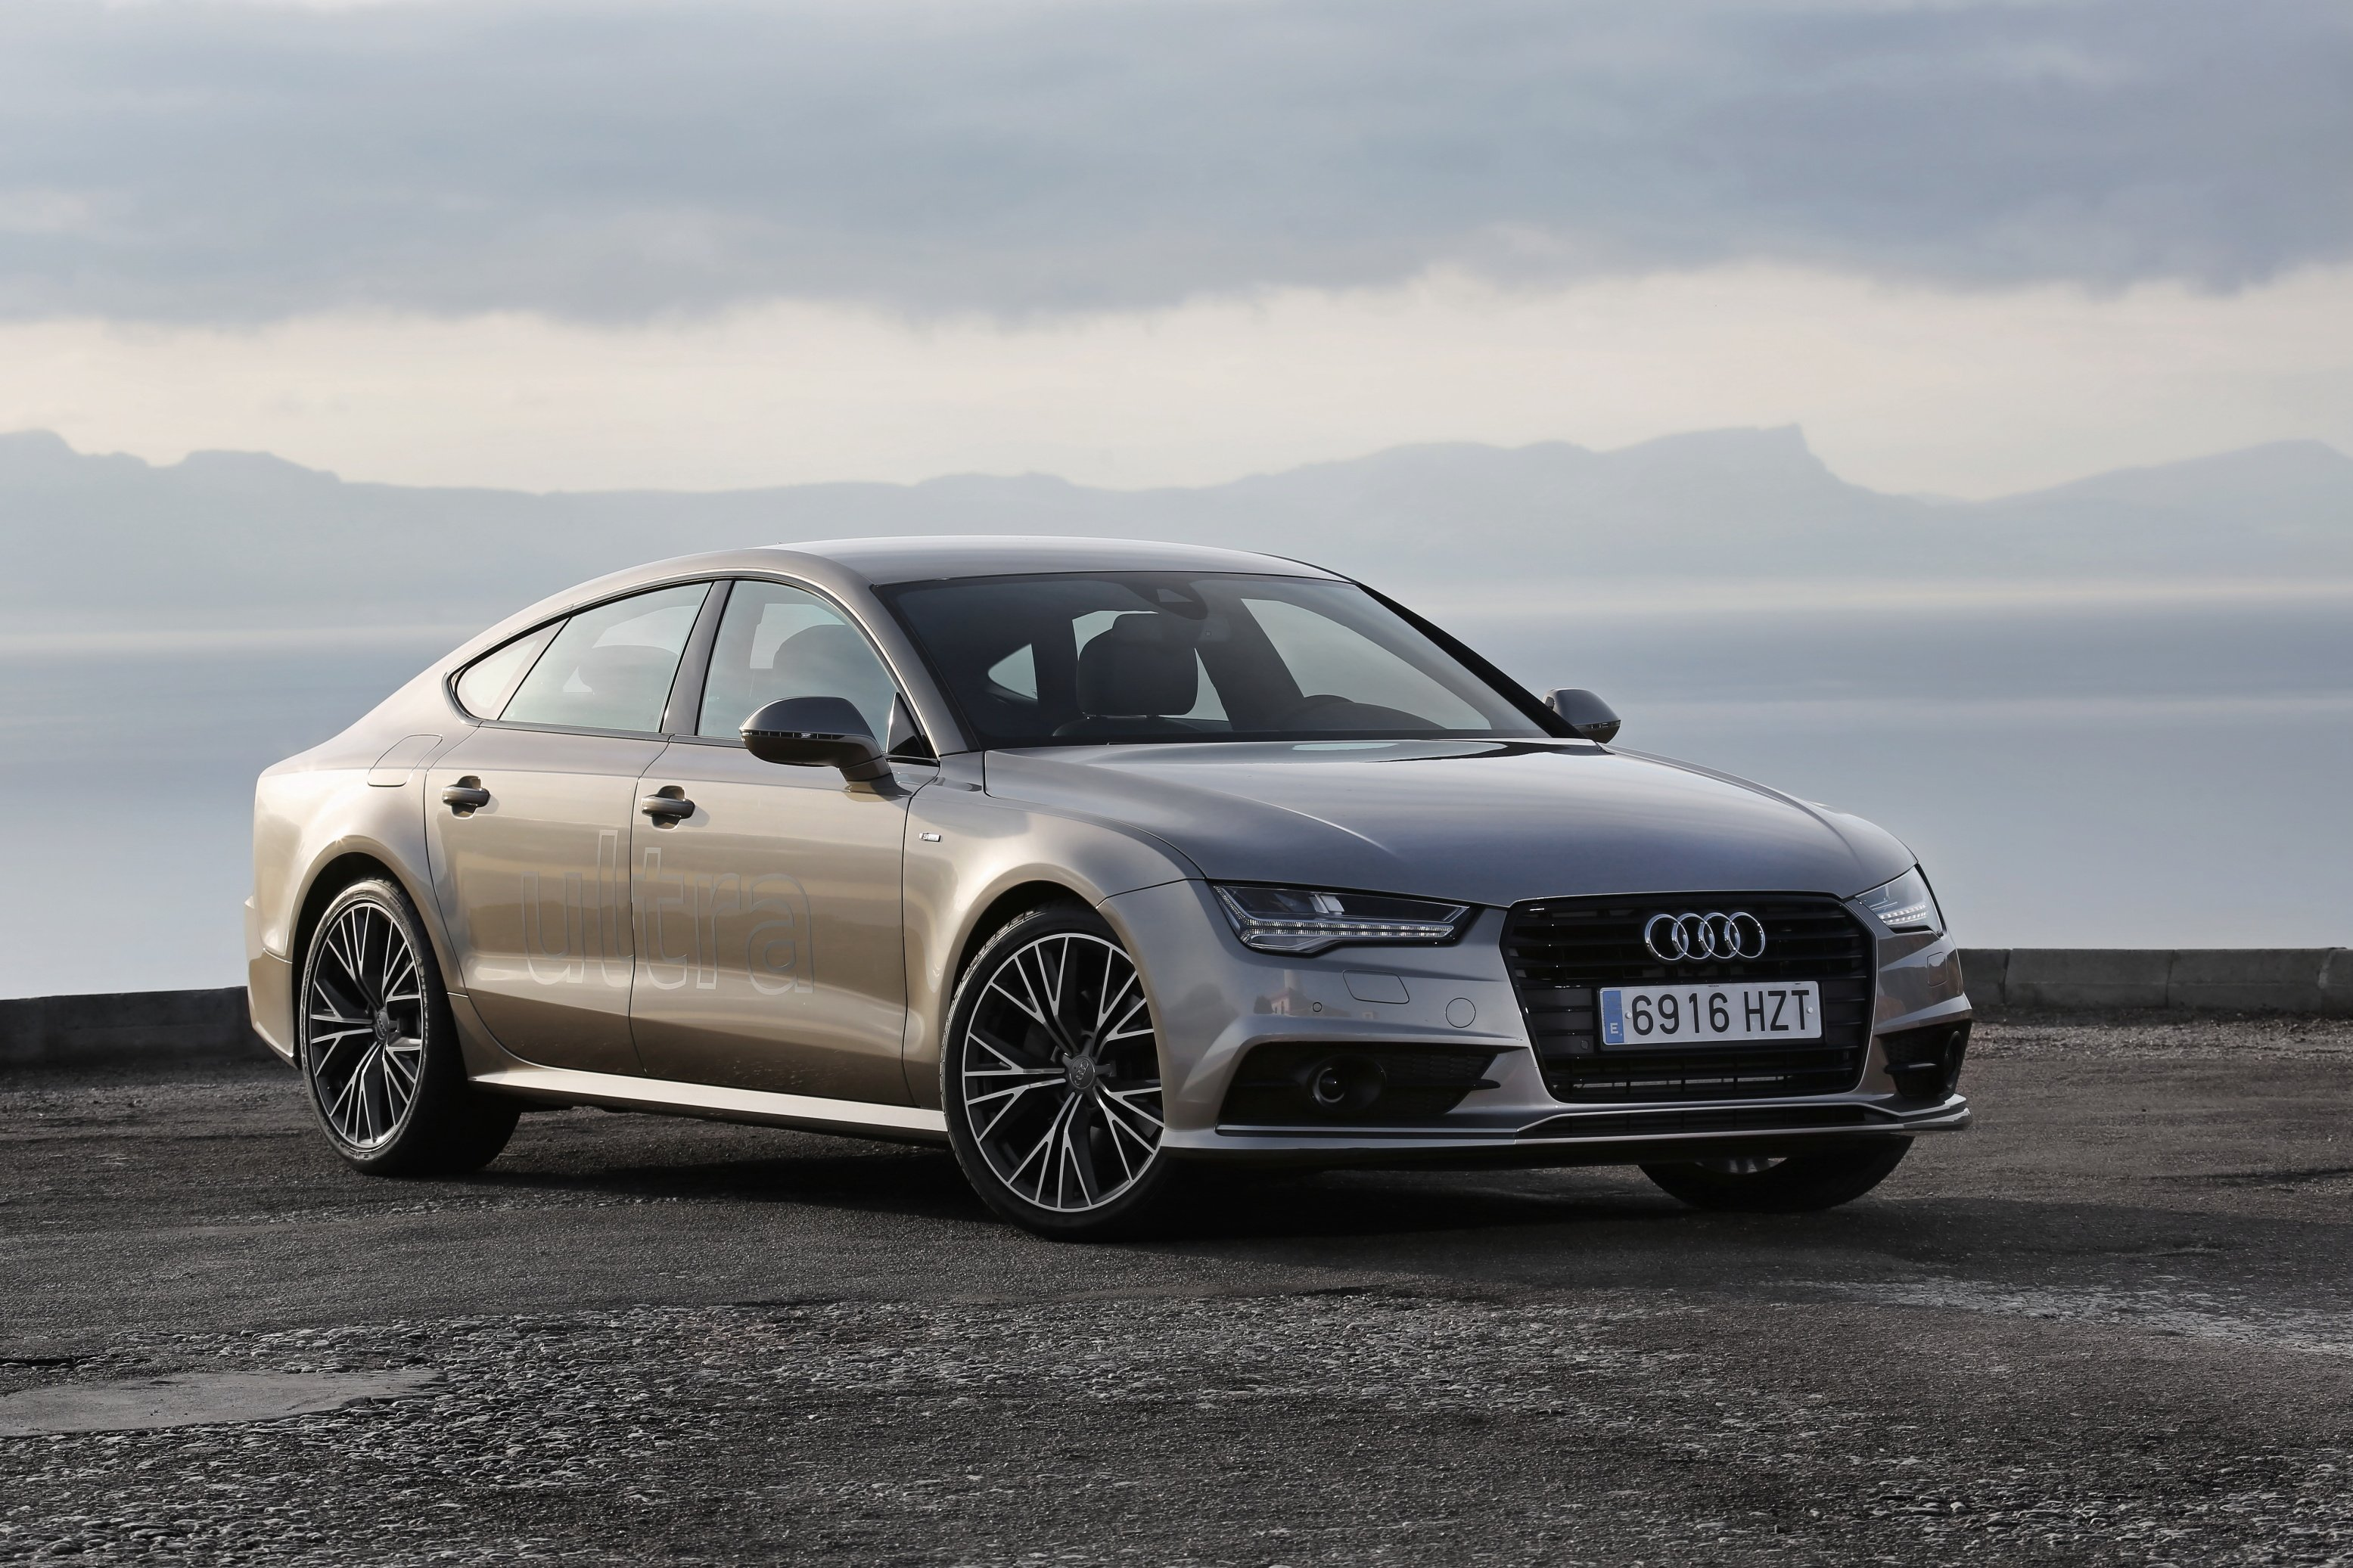 Audi A7 Sportback 3 0 TDI ultra S-Line 2014 cars wallpaper ...